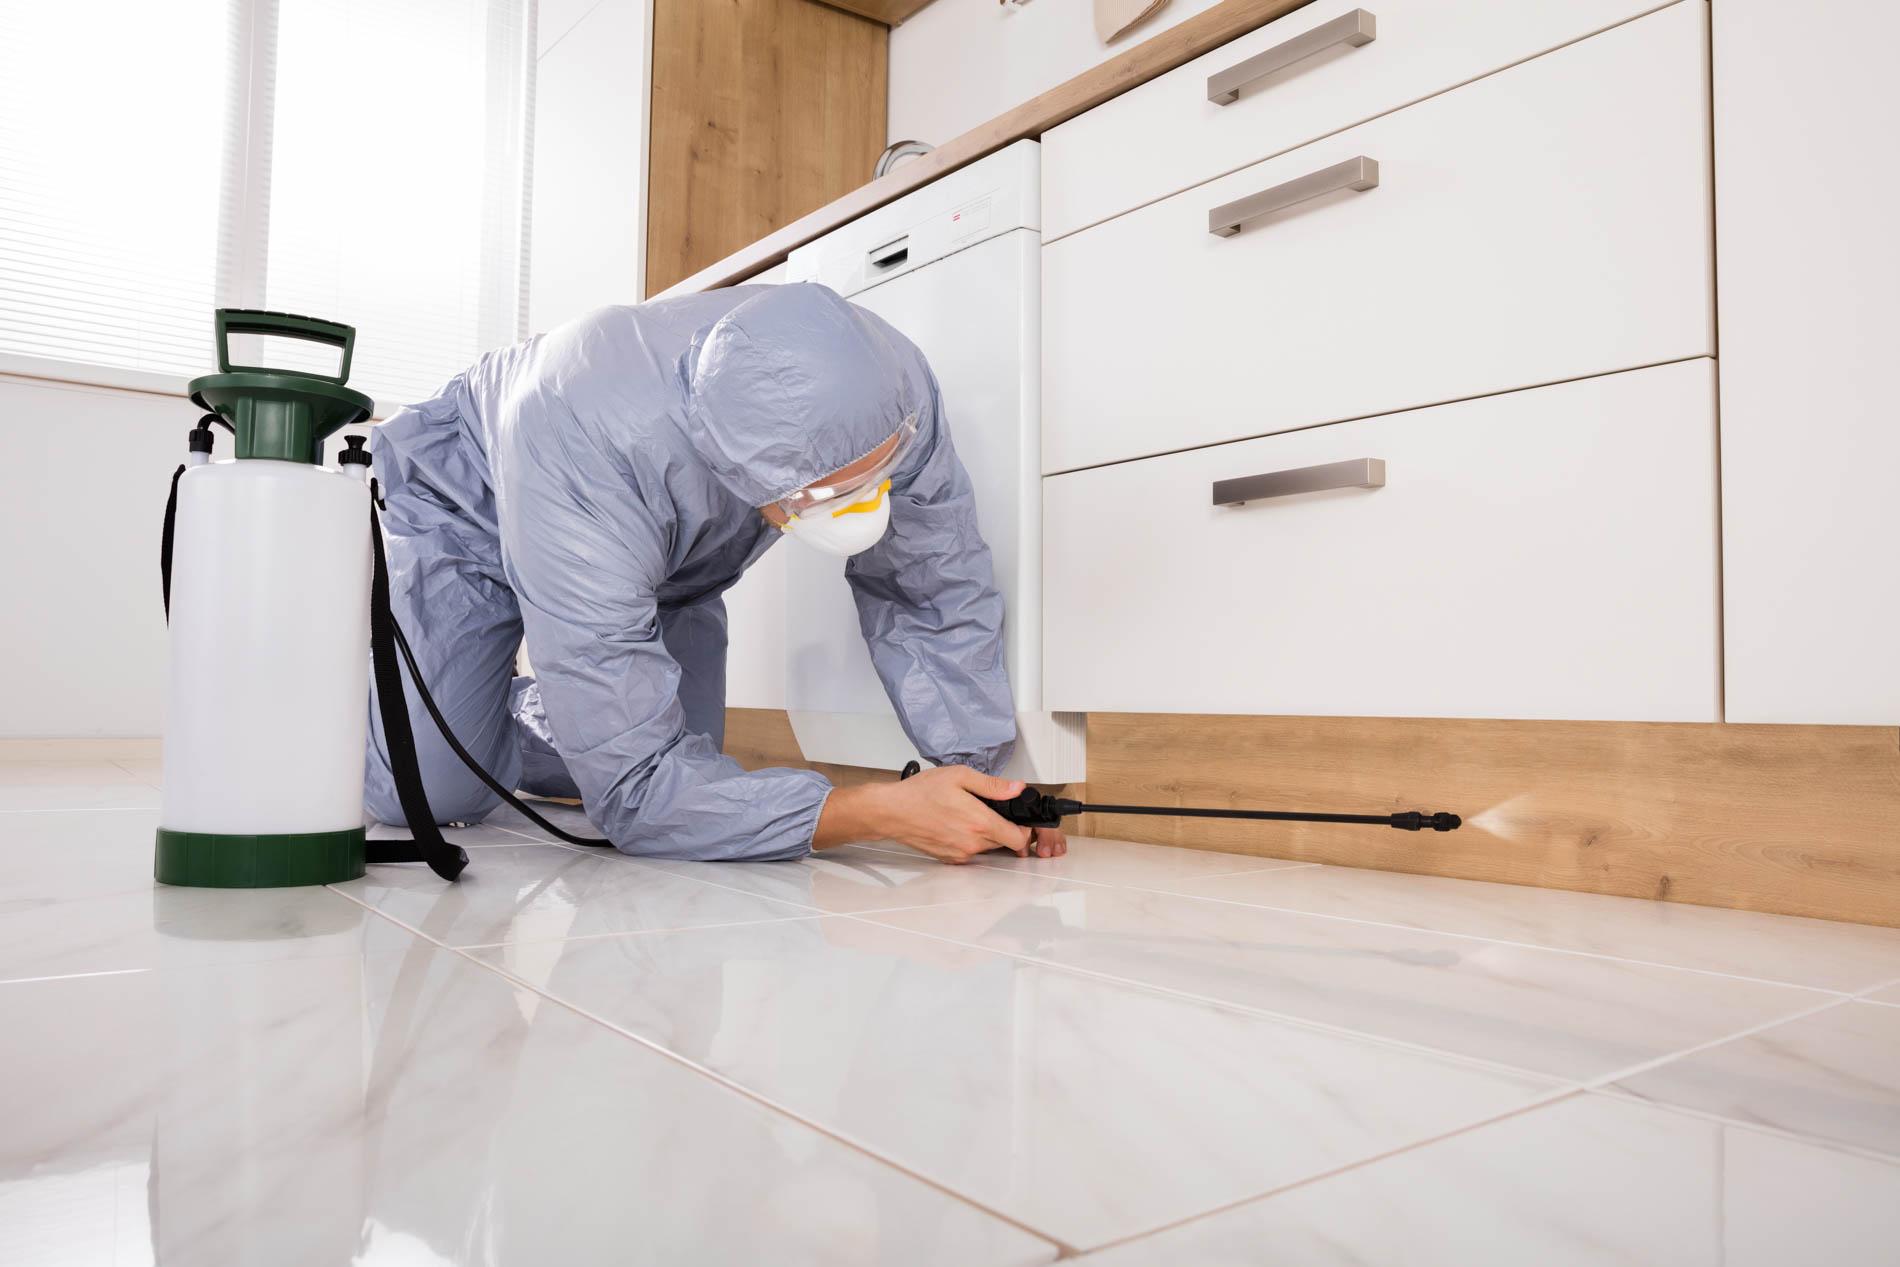 Exterminator,In,Workwear,Spraying,Pesticide,With,Sprayer